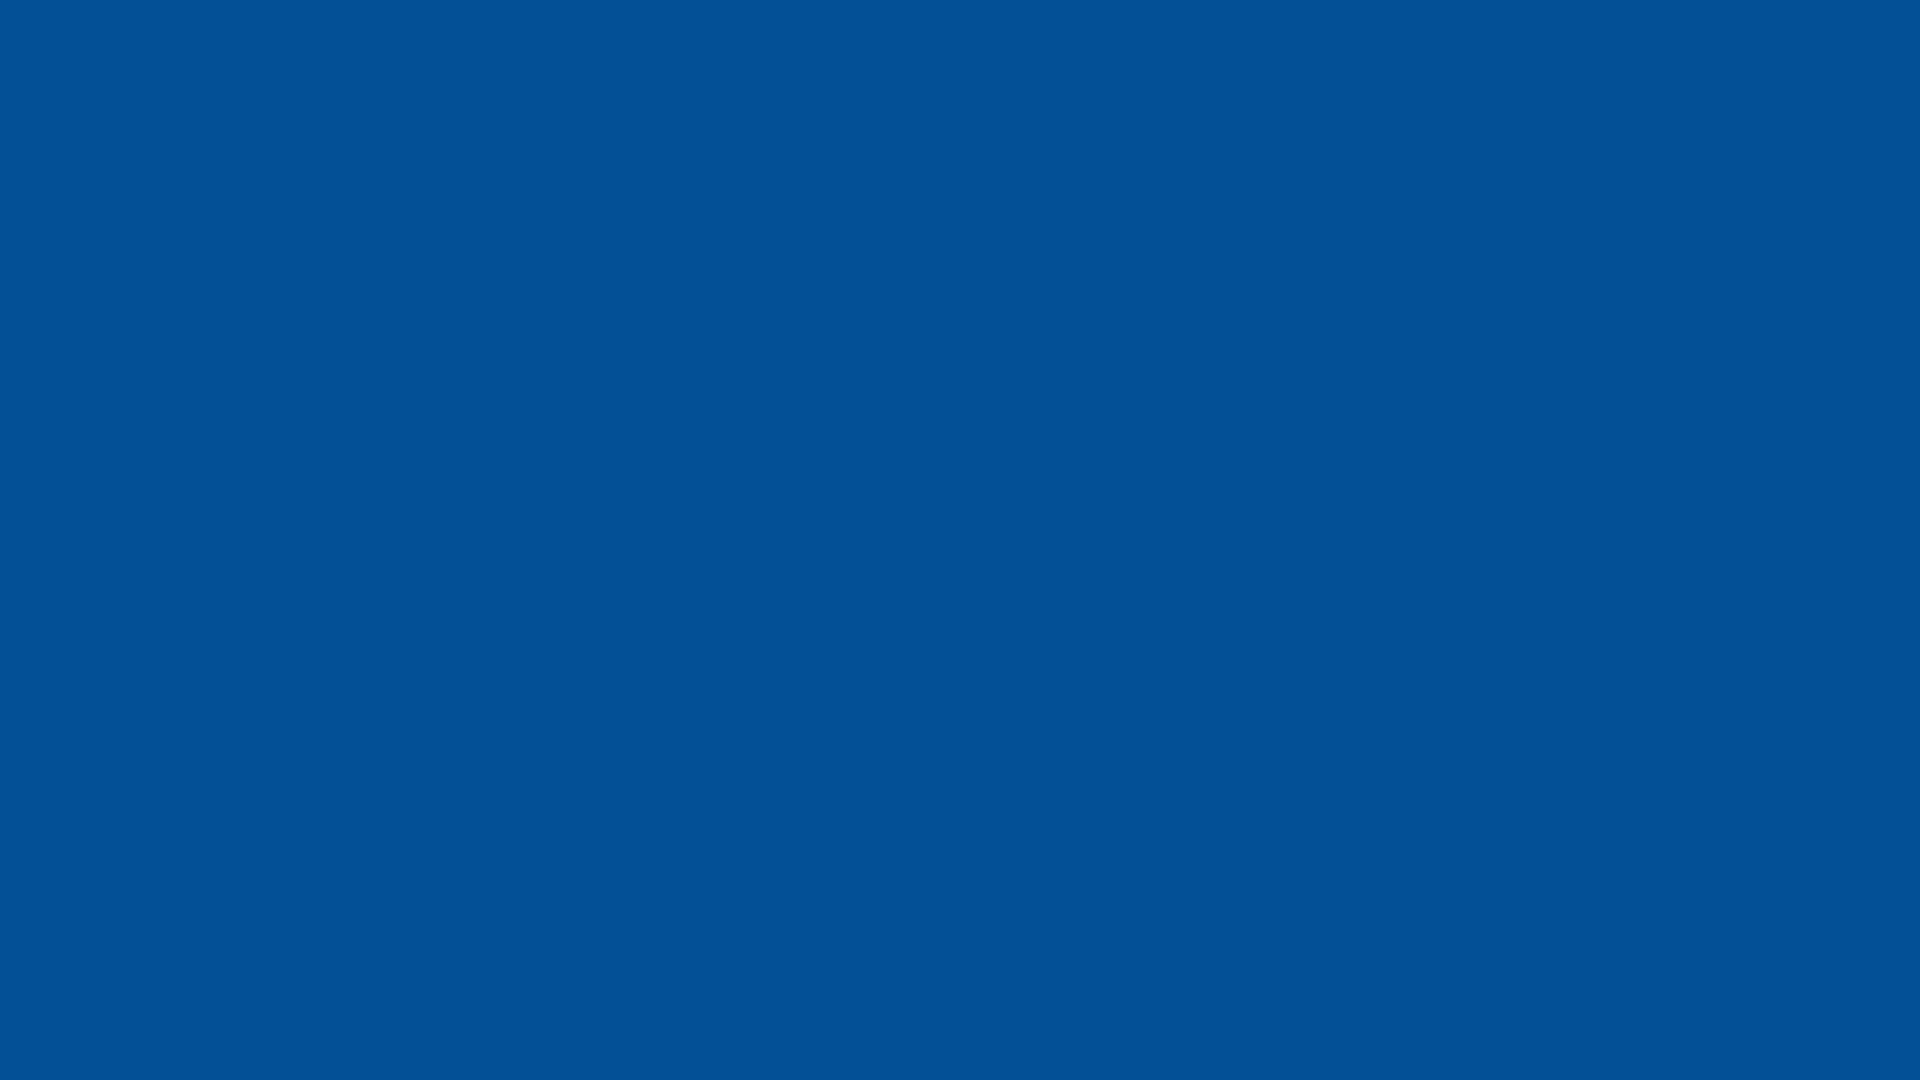 solid blue wallpaper 47195 1920x1080 px ~ hdwallsource